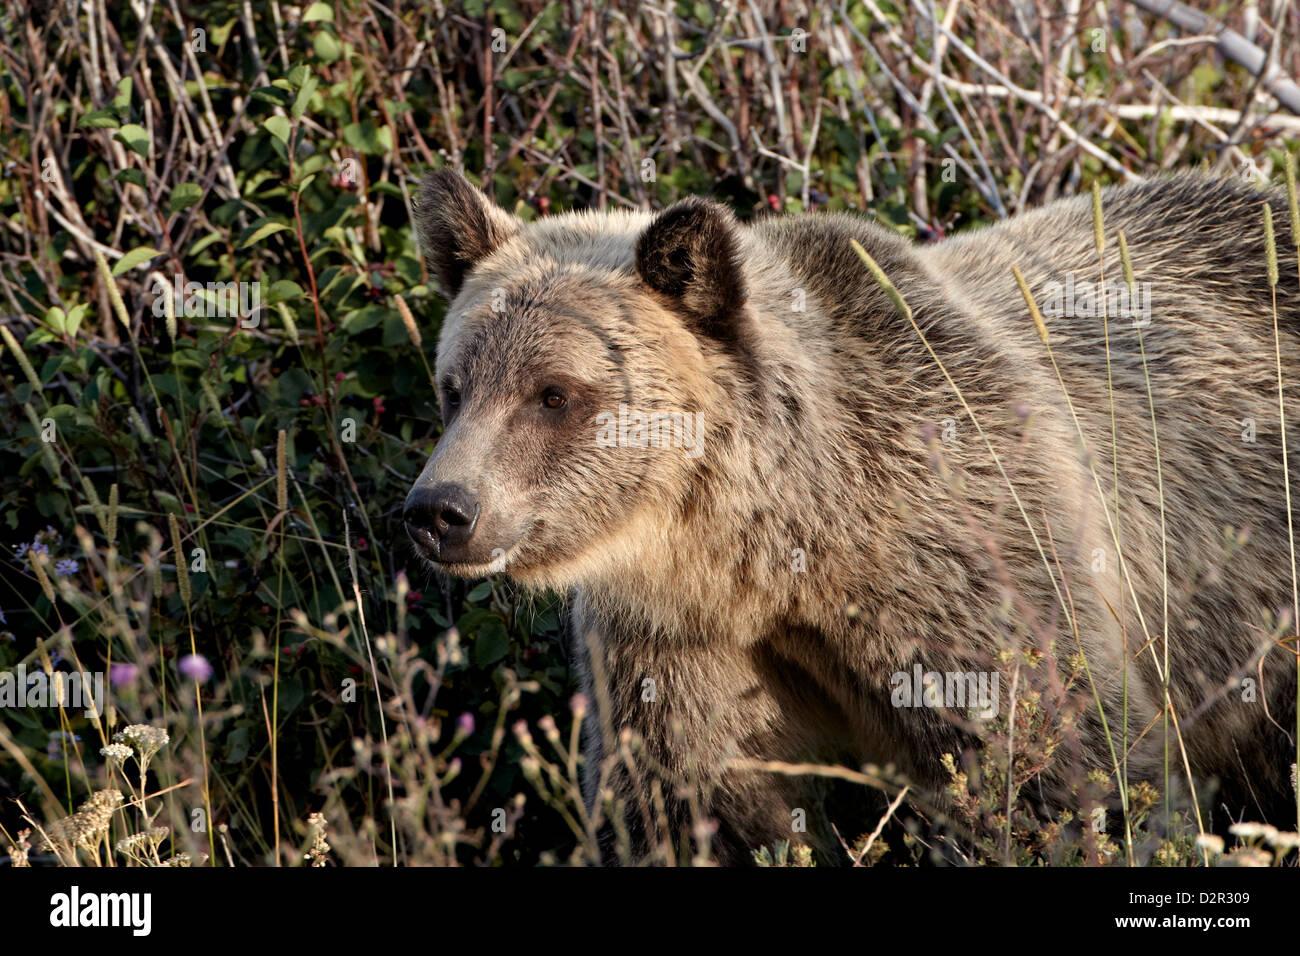 Grizzly bear (Ursus arctos horribilis), Glacier National Park, Montana, United States of America, North America - Stock Image